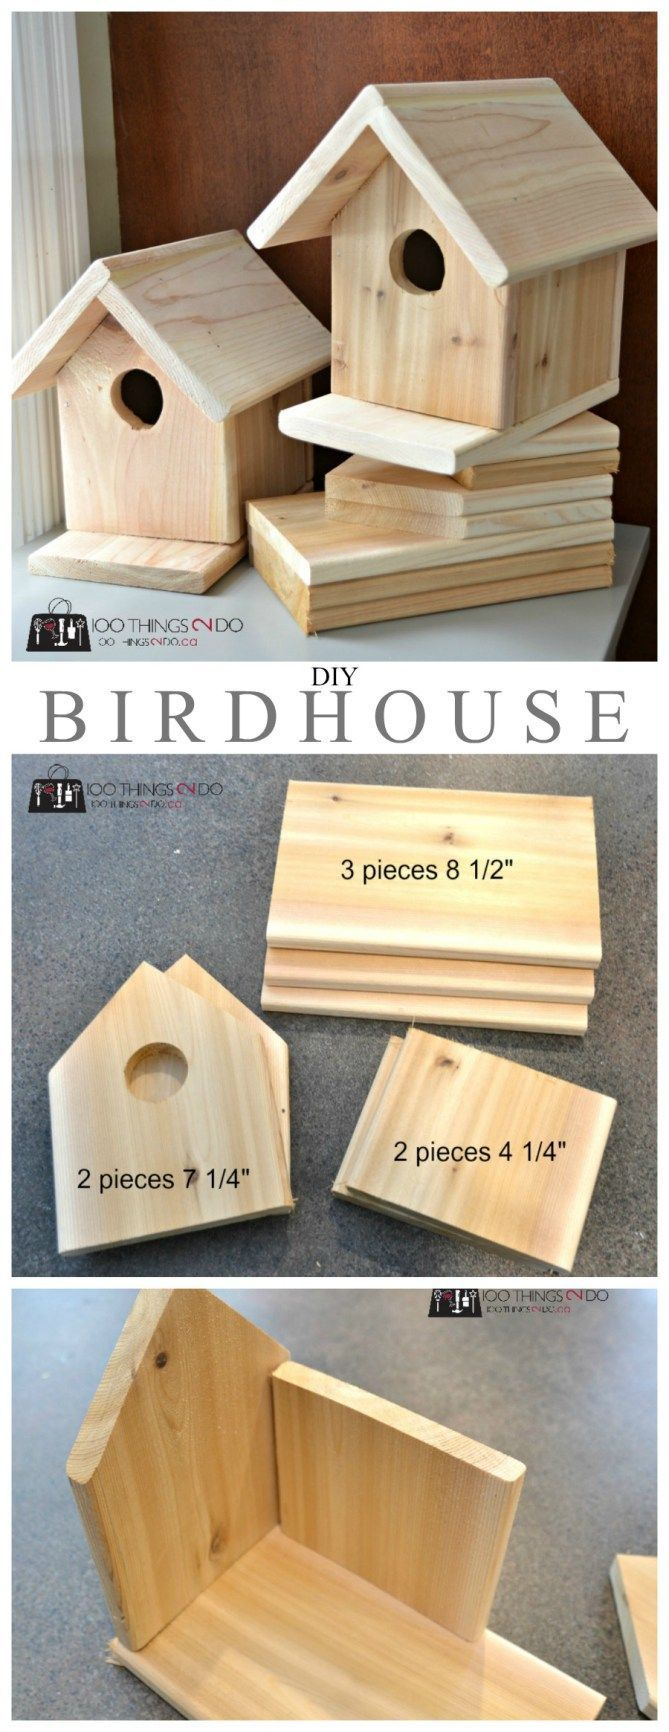 Diy Birdhouse Easy Craft Ideas Bird Houses Diy Woodworking